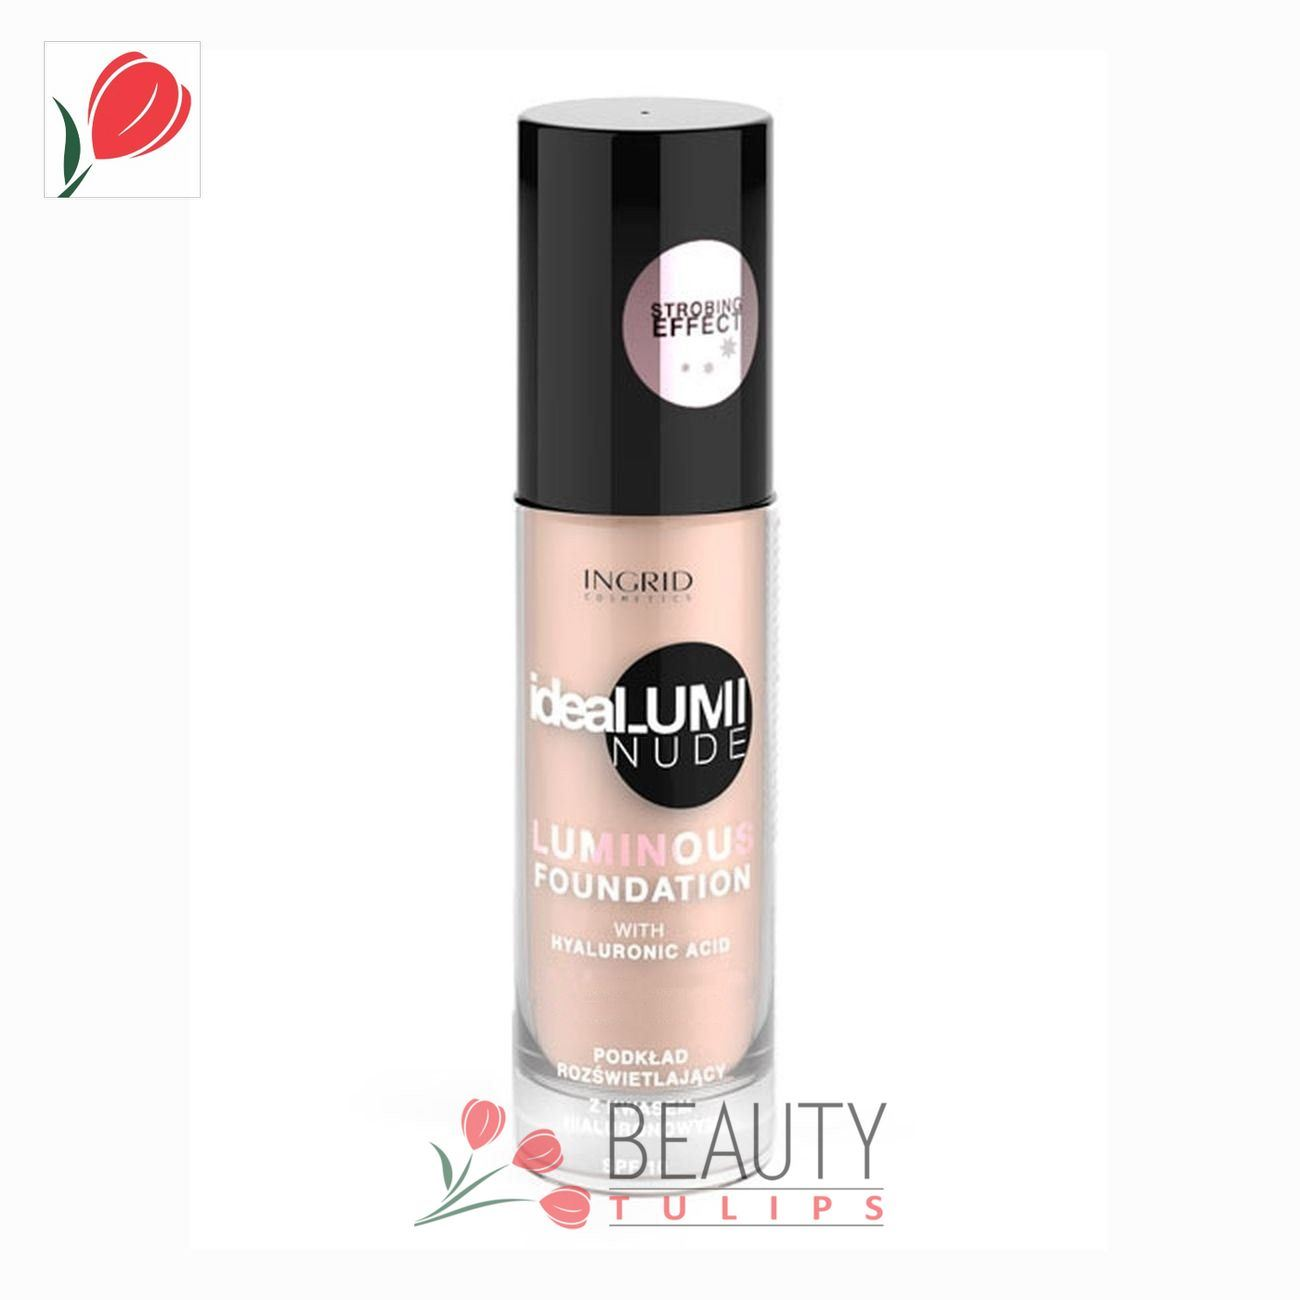 Ingrid Cosmetics Idealumi Nude Foundation SPF 10